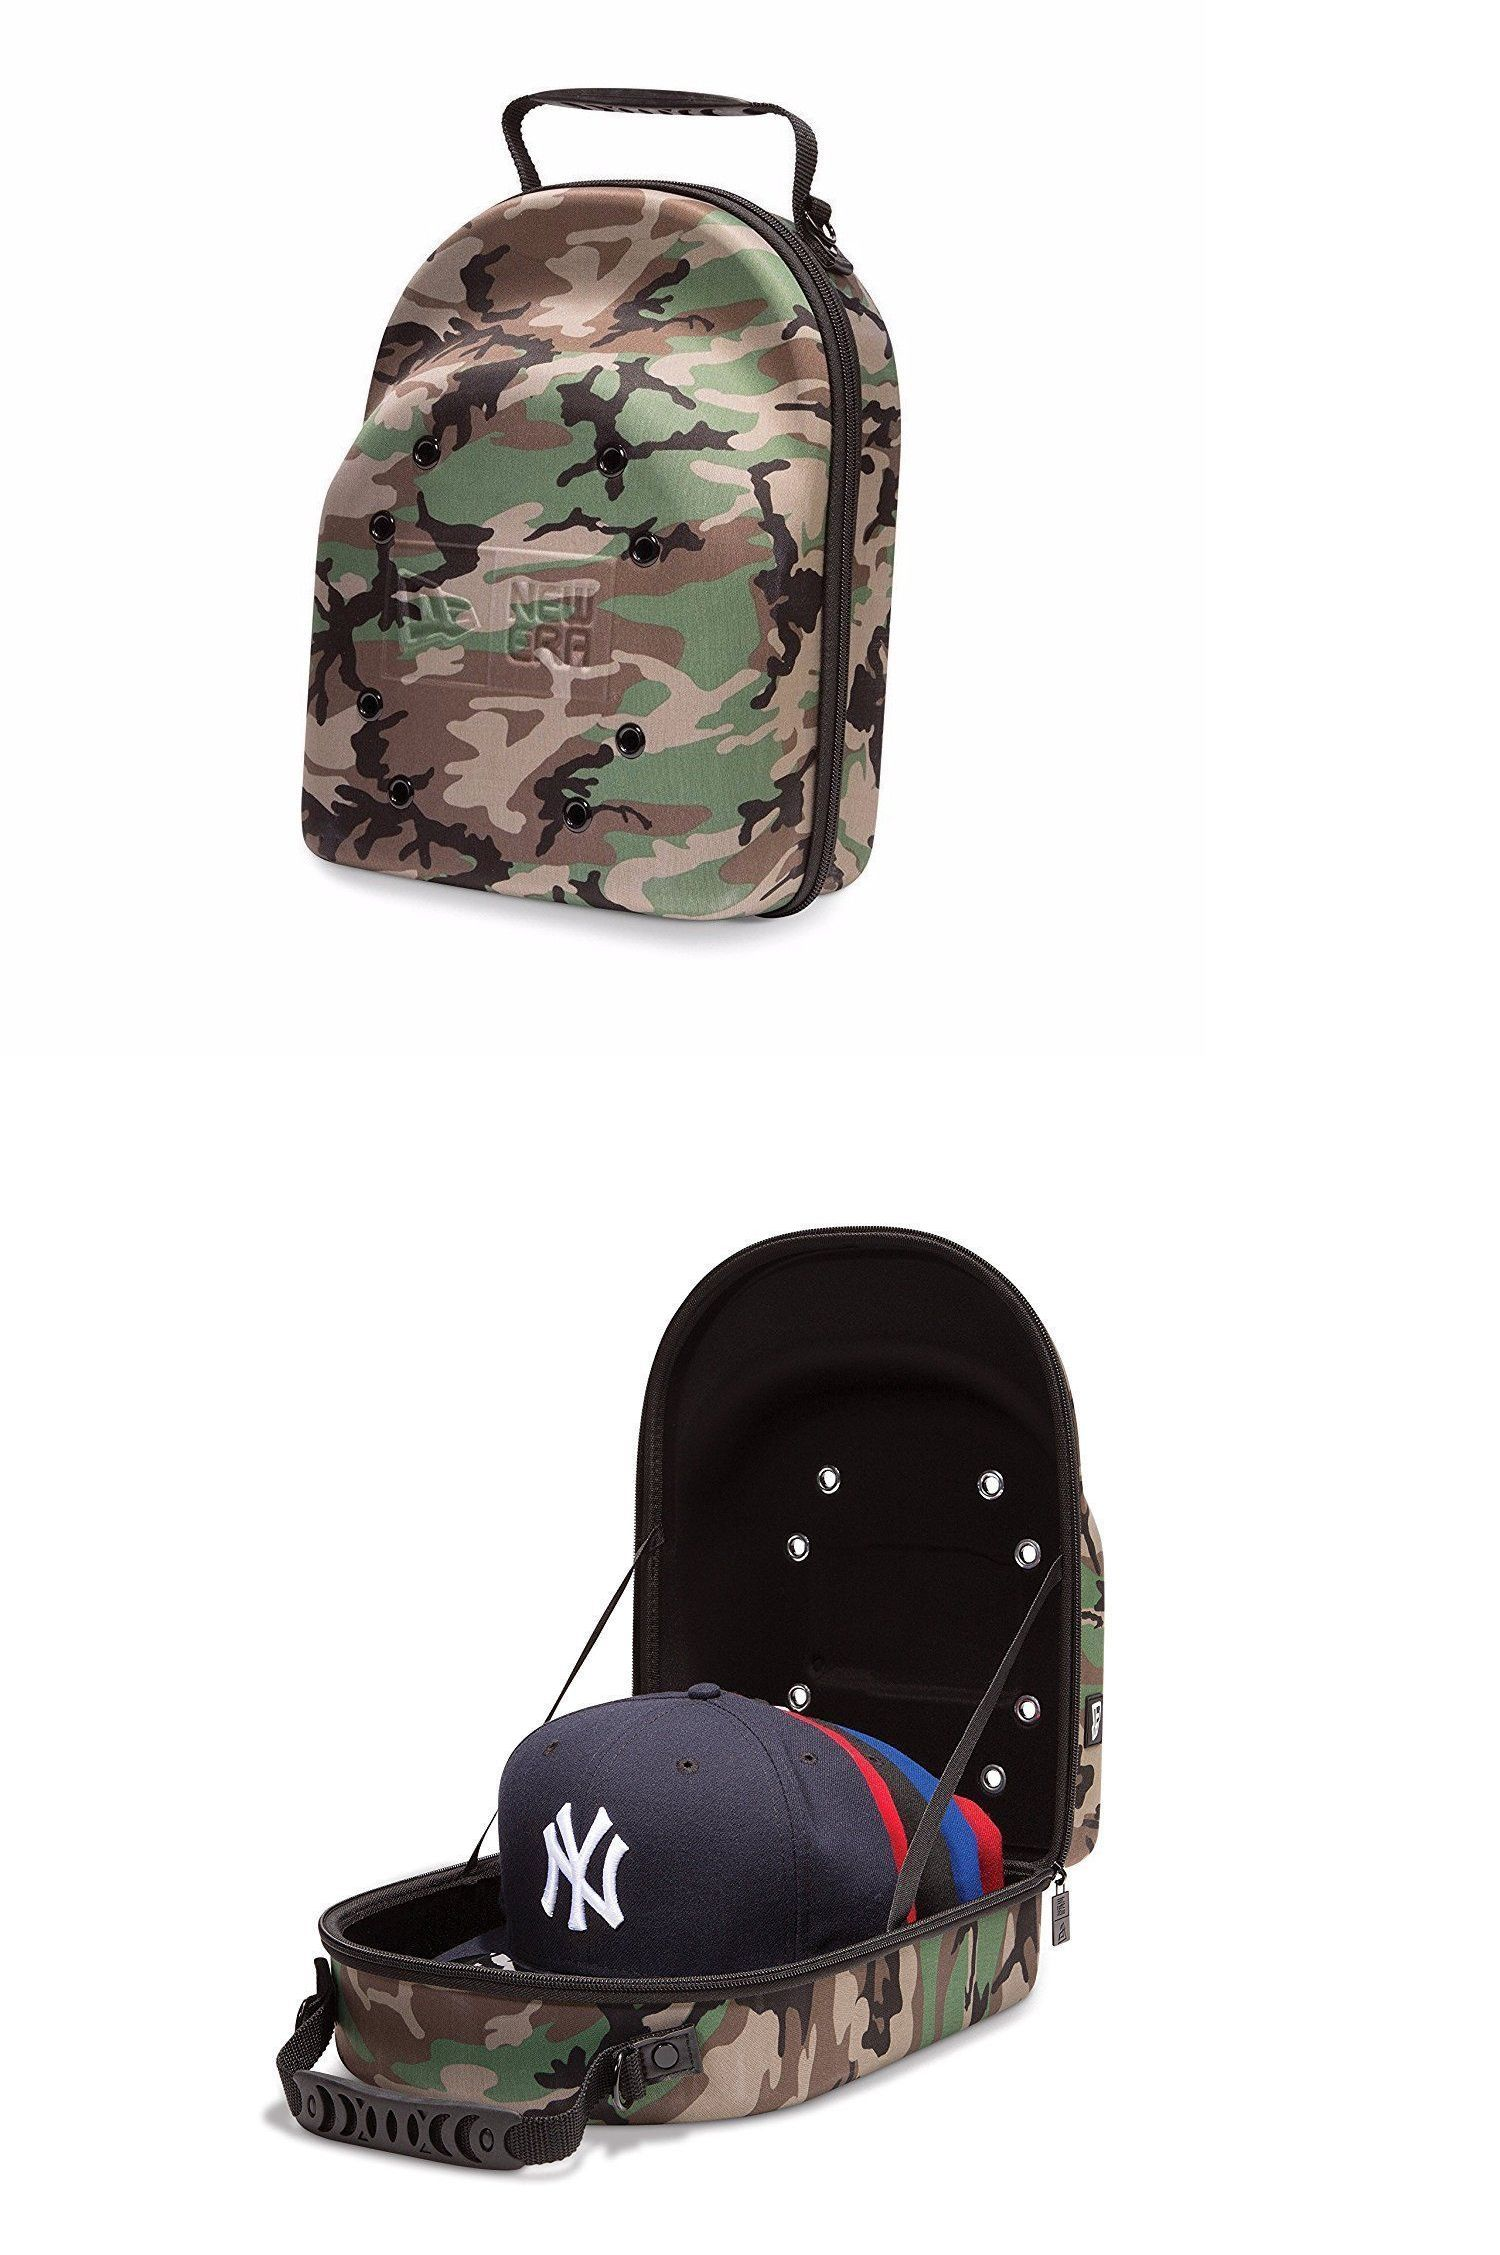 Hats and Headgear 155349: New Era Cap Hat Carrier Camo